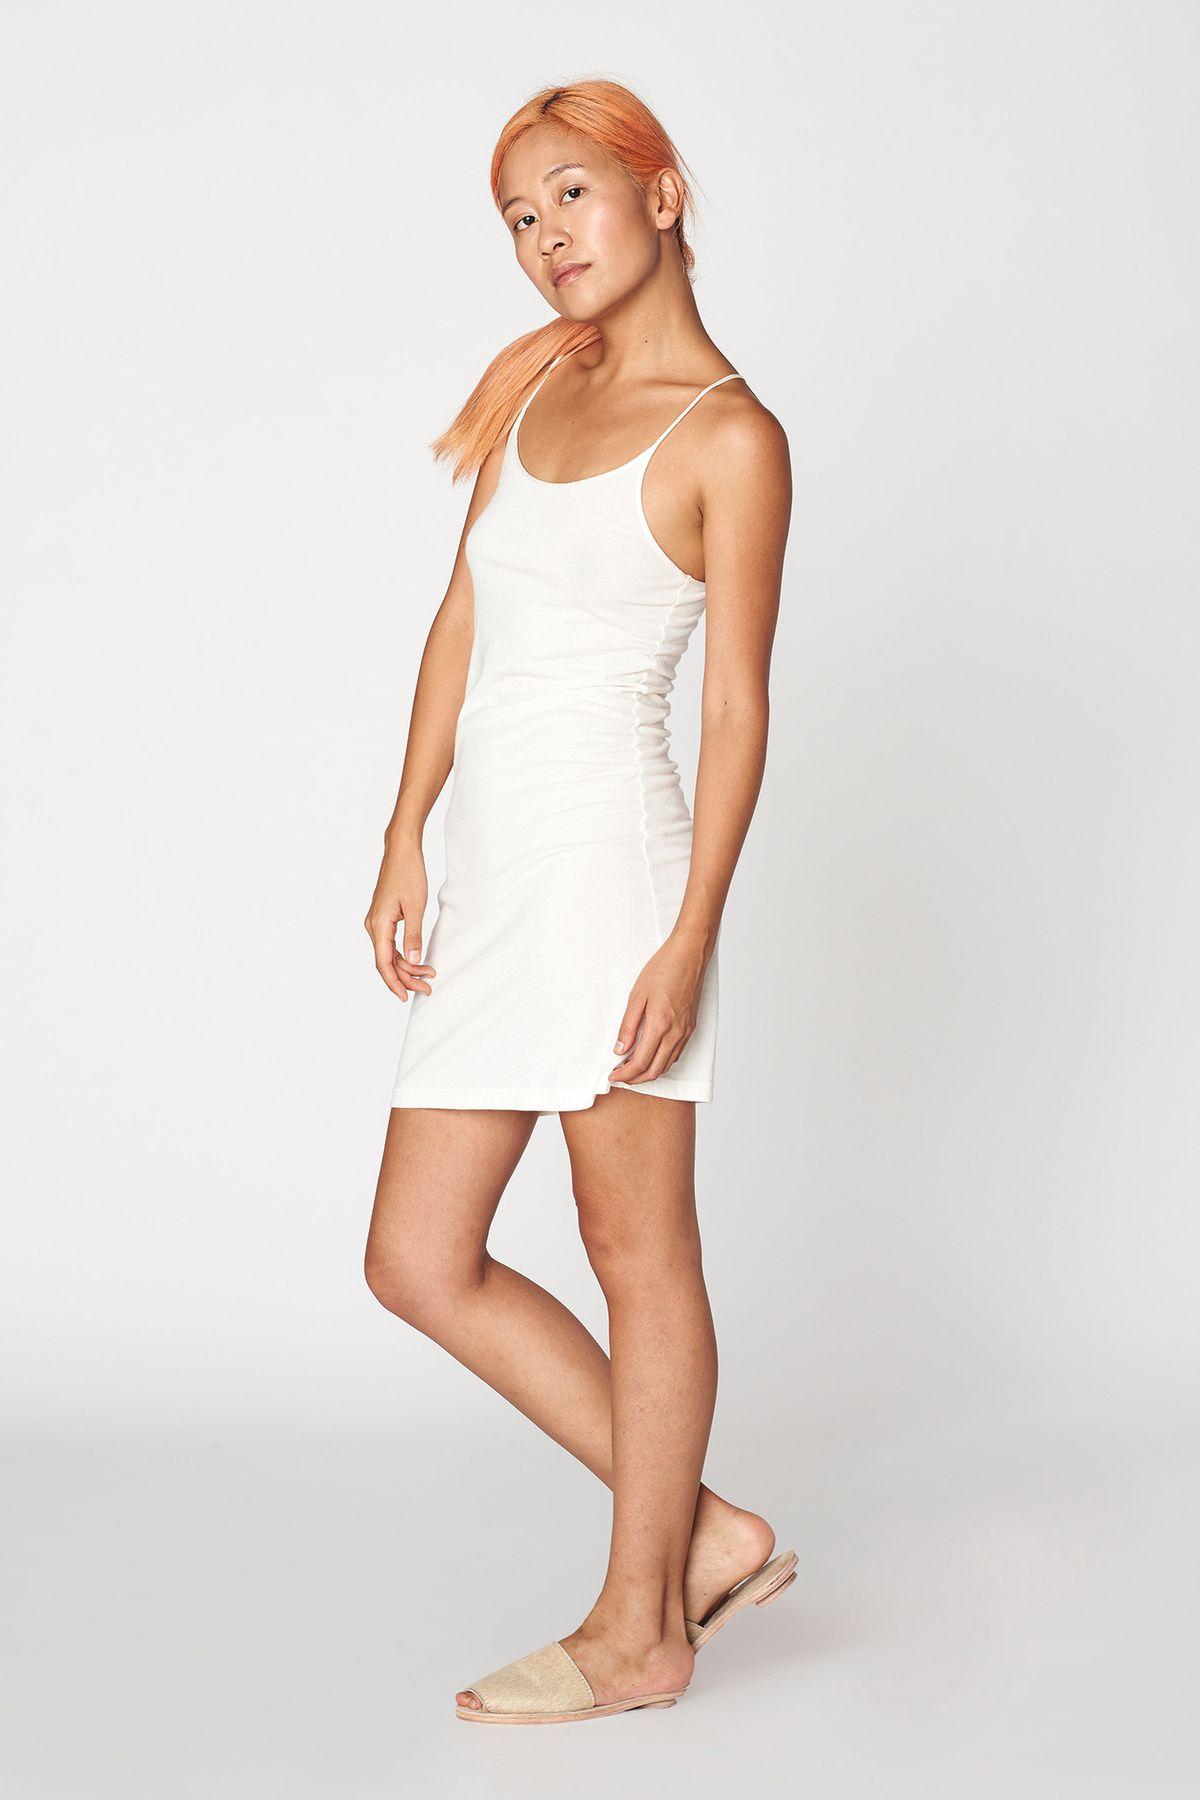 A model in a white cotton dress